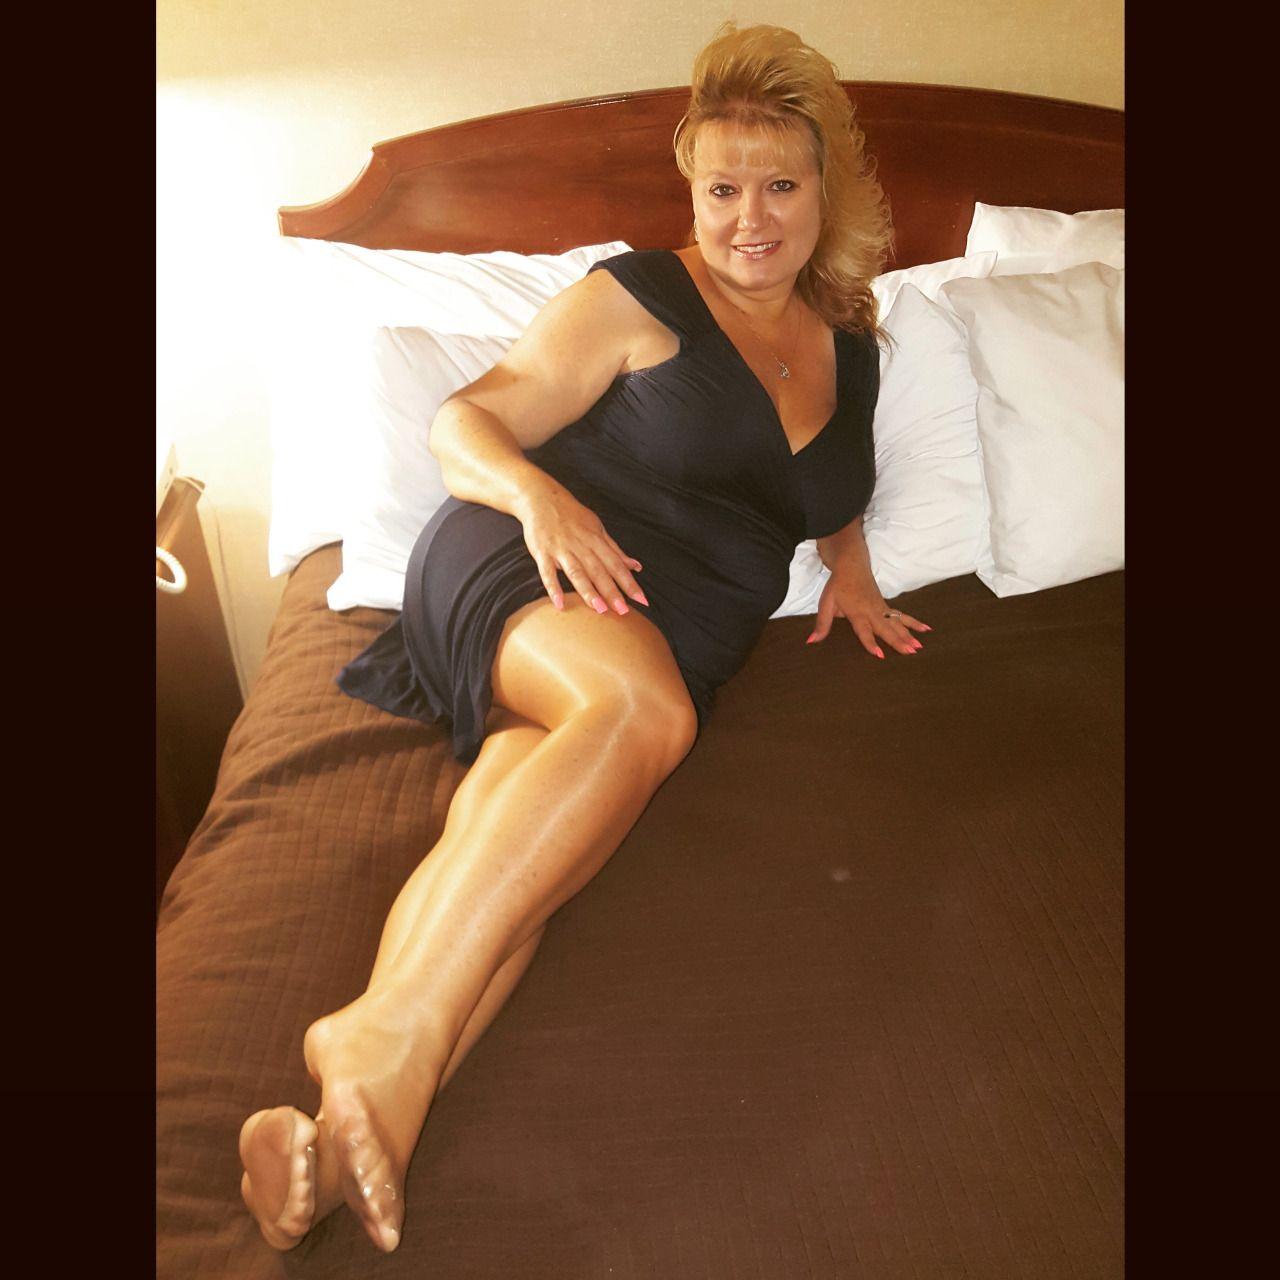 photogbikerhack: Real pantyhose wearing wife  Wish it